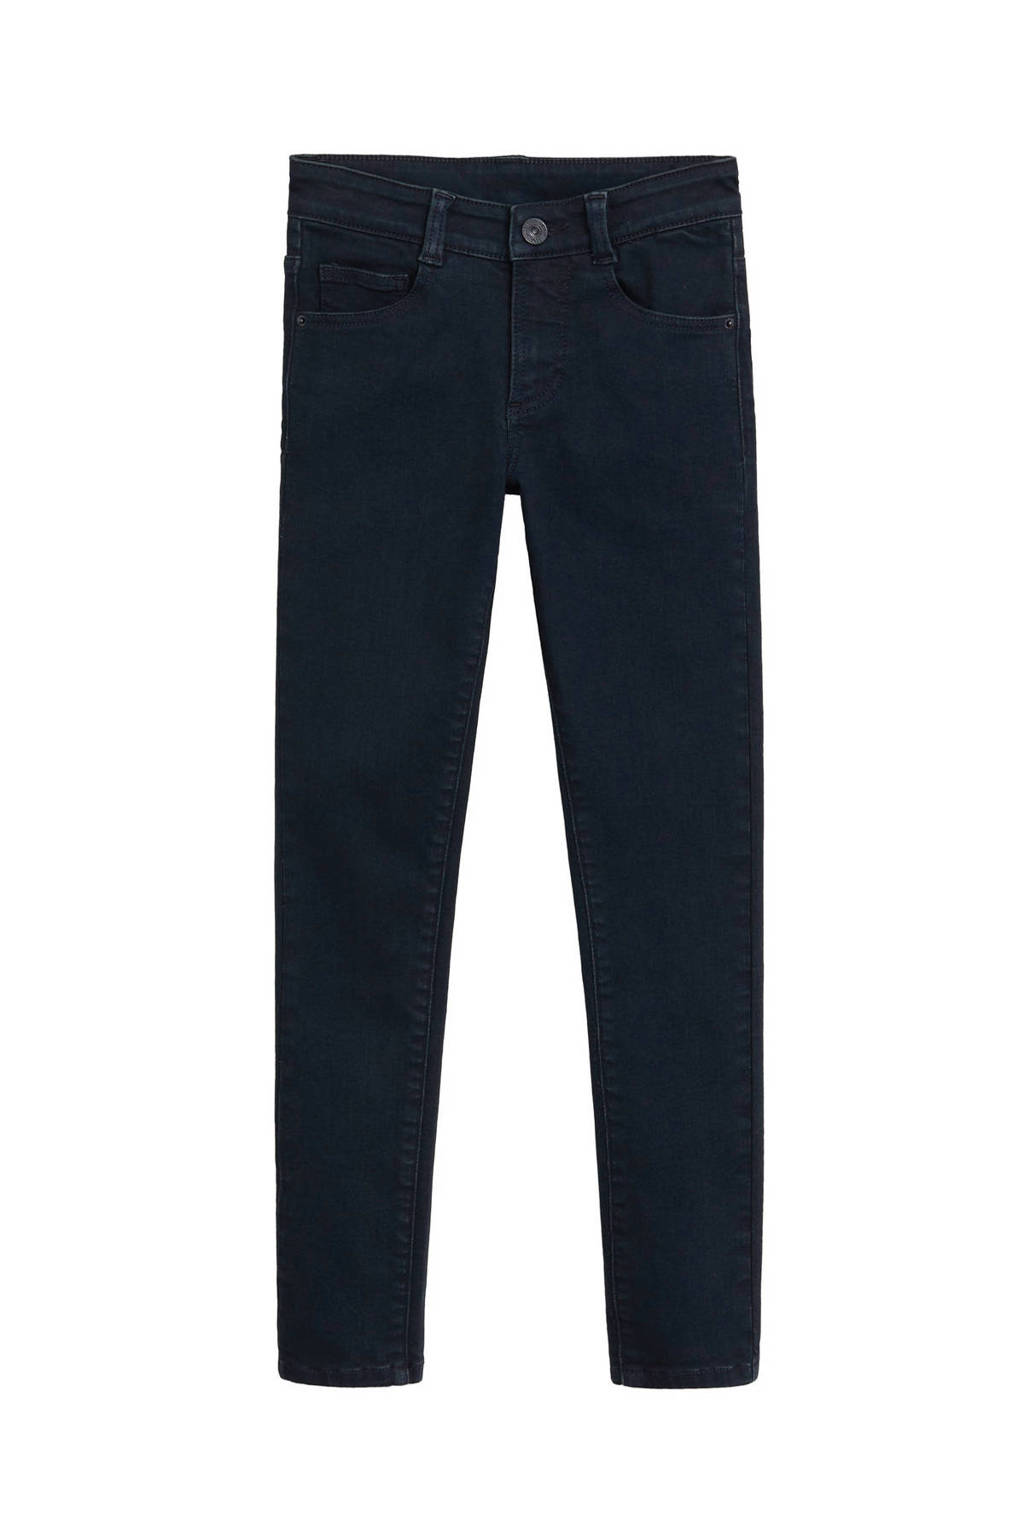 Mango Kids skinny jeans dark denim, Dark denim